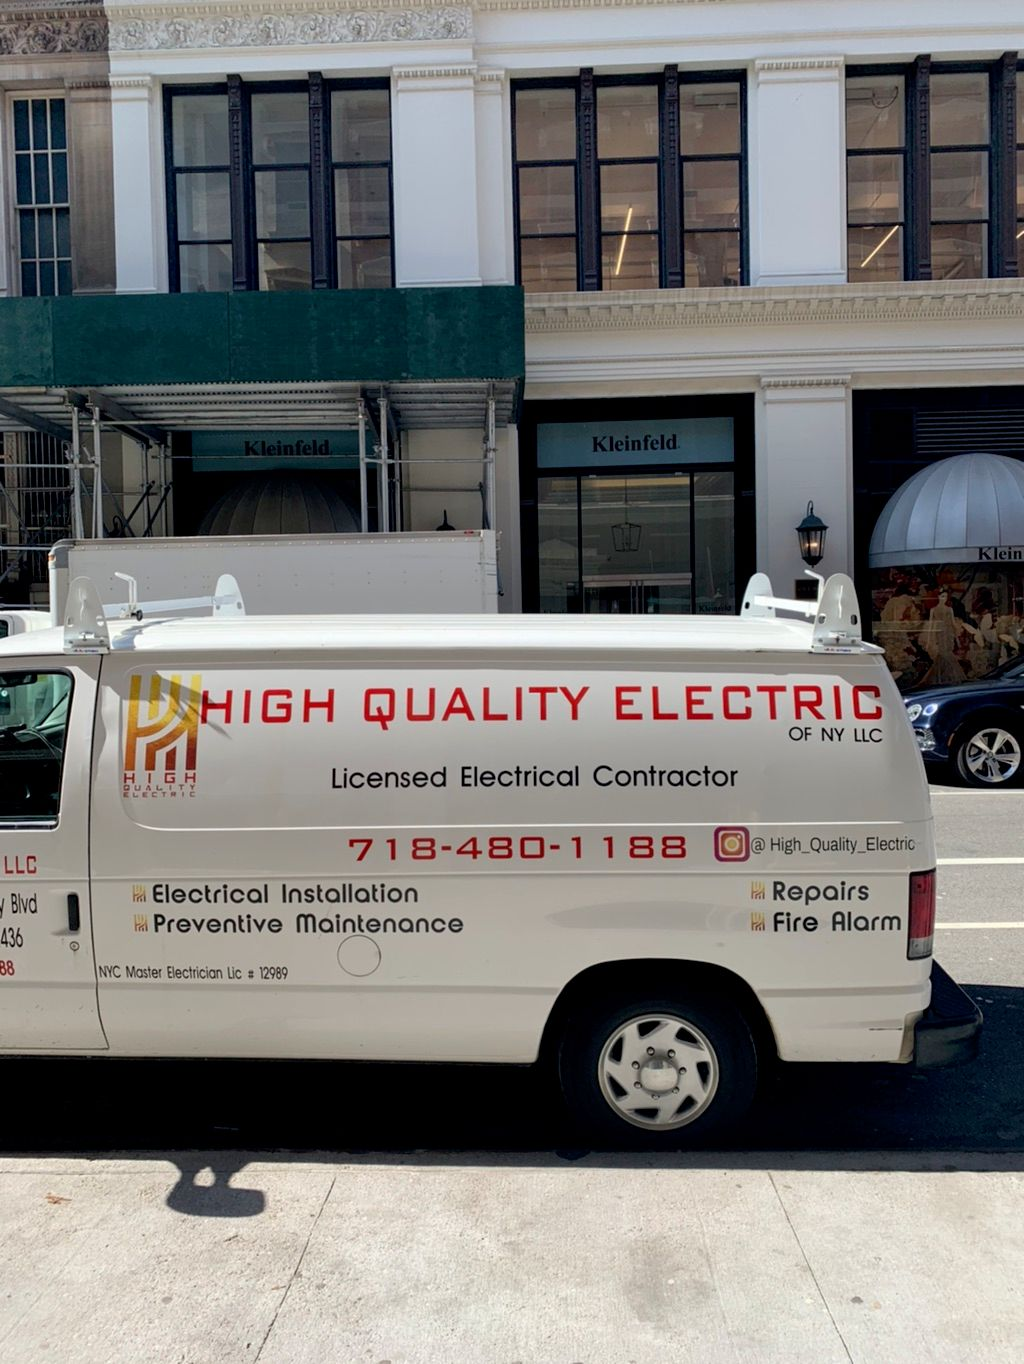 High Quality Electric of NY LLC